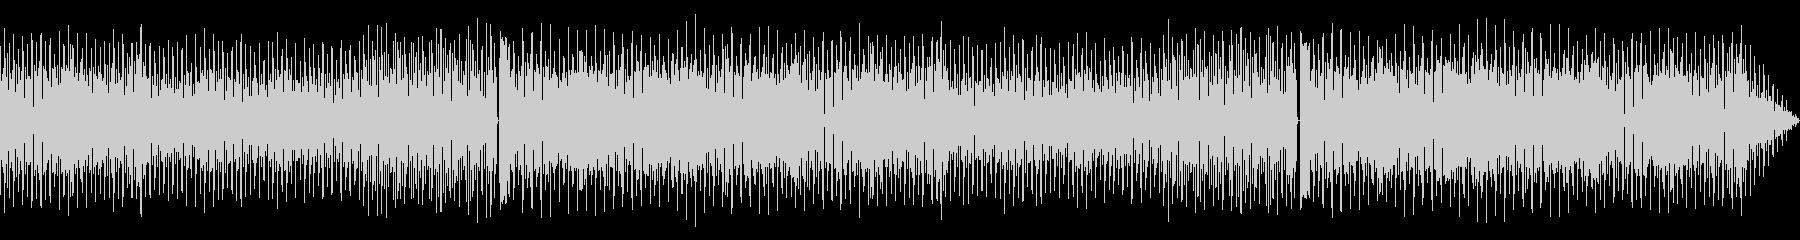 FM音源チップチューンの未再生の波形